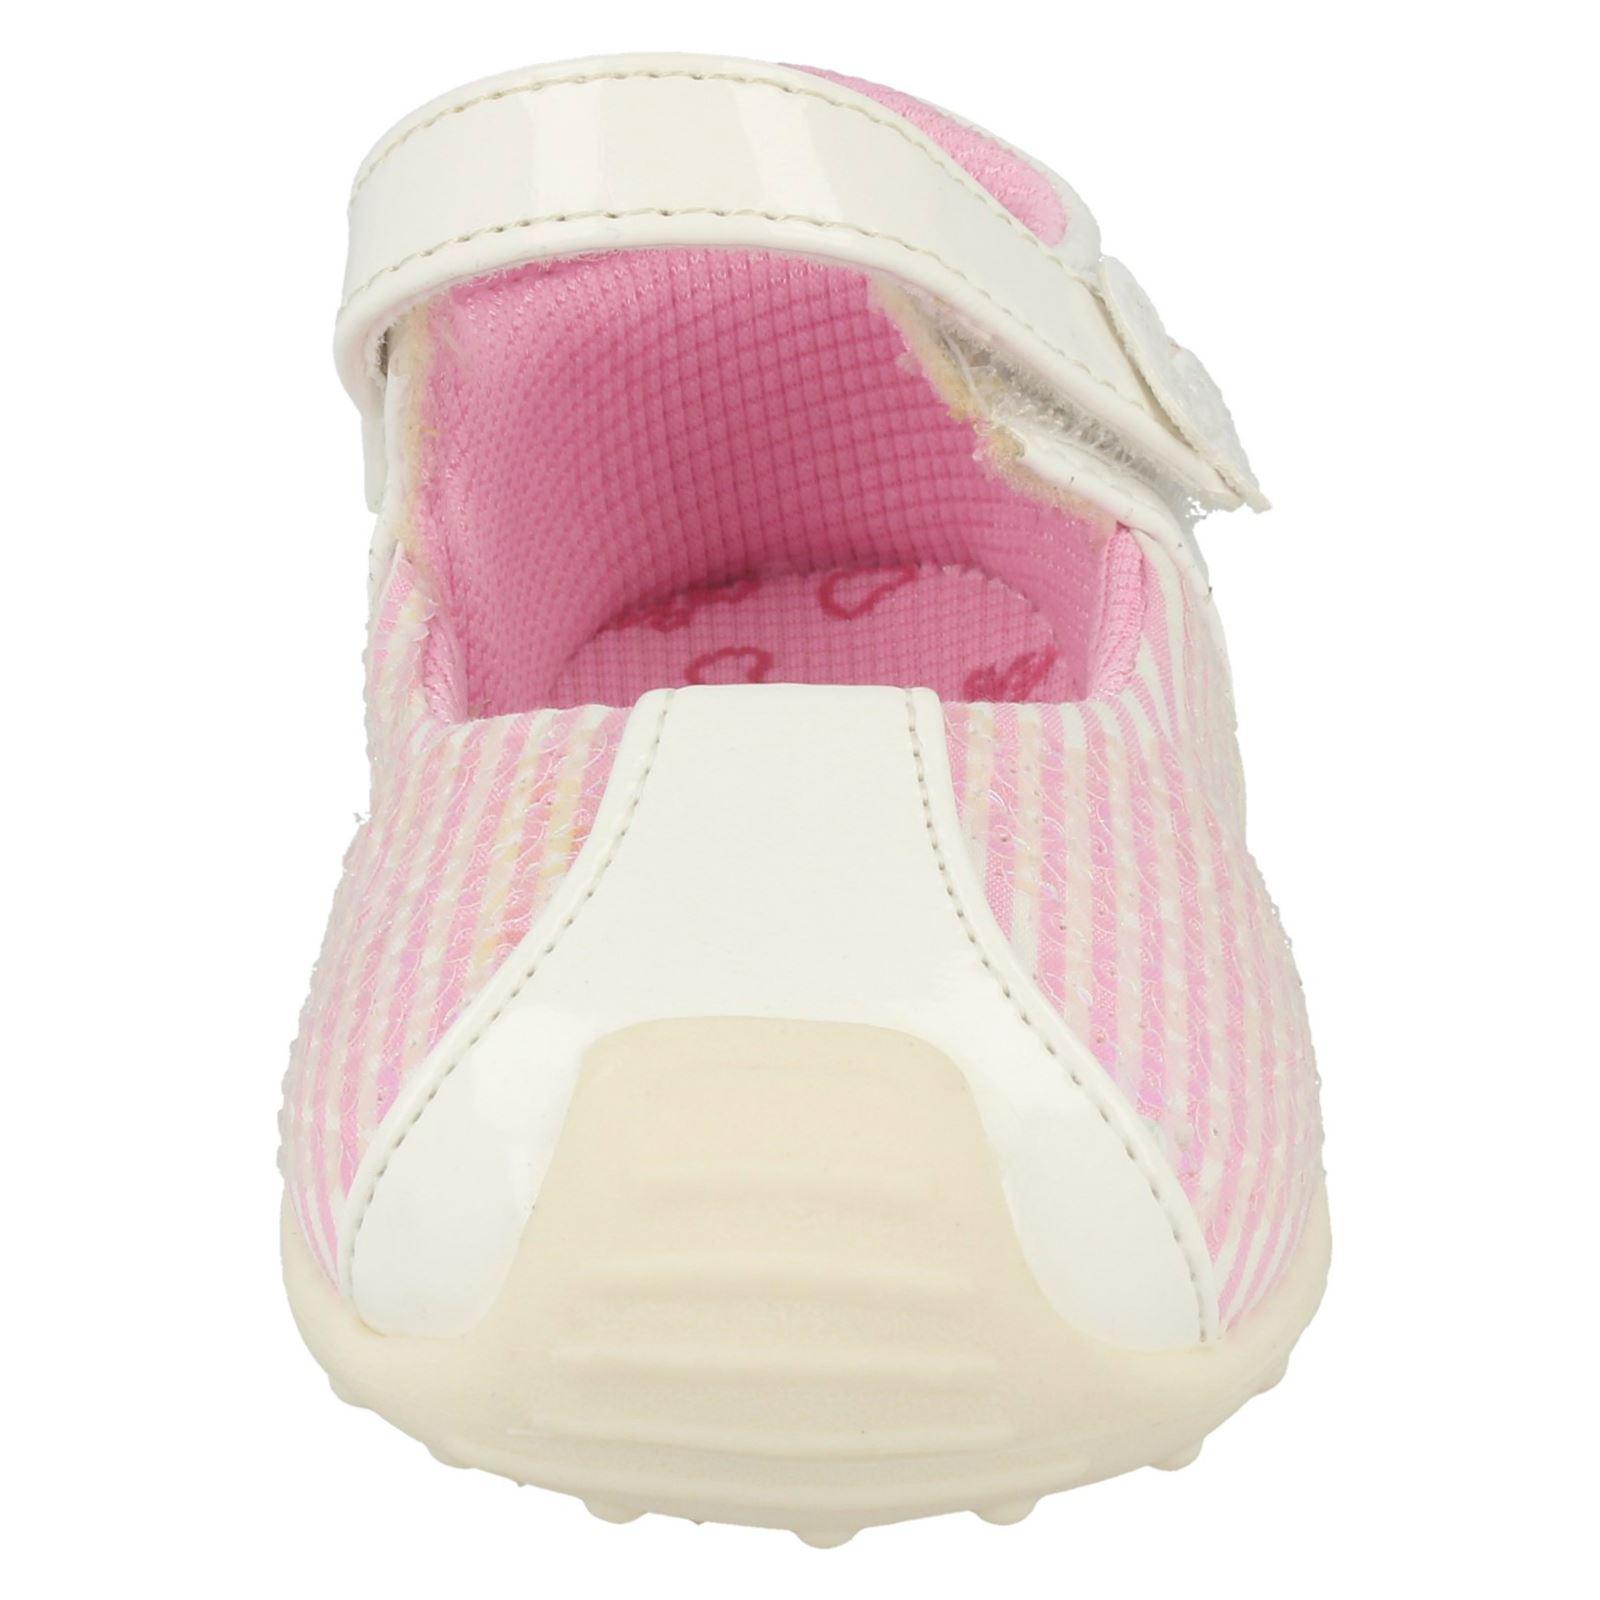 Infantil Chicas Cutie Detalle De Lentejuelas Zapatos Planos